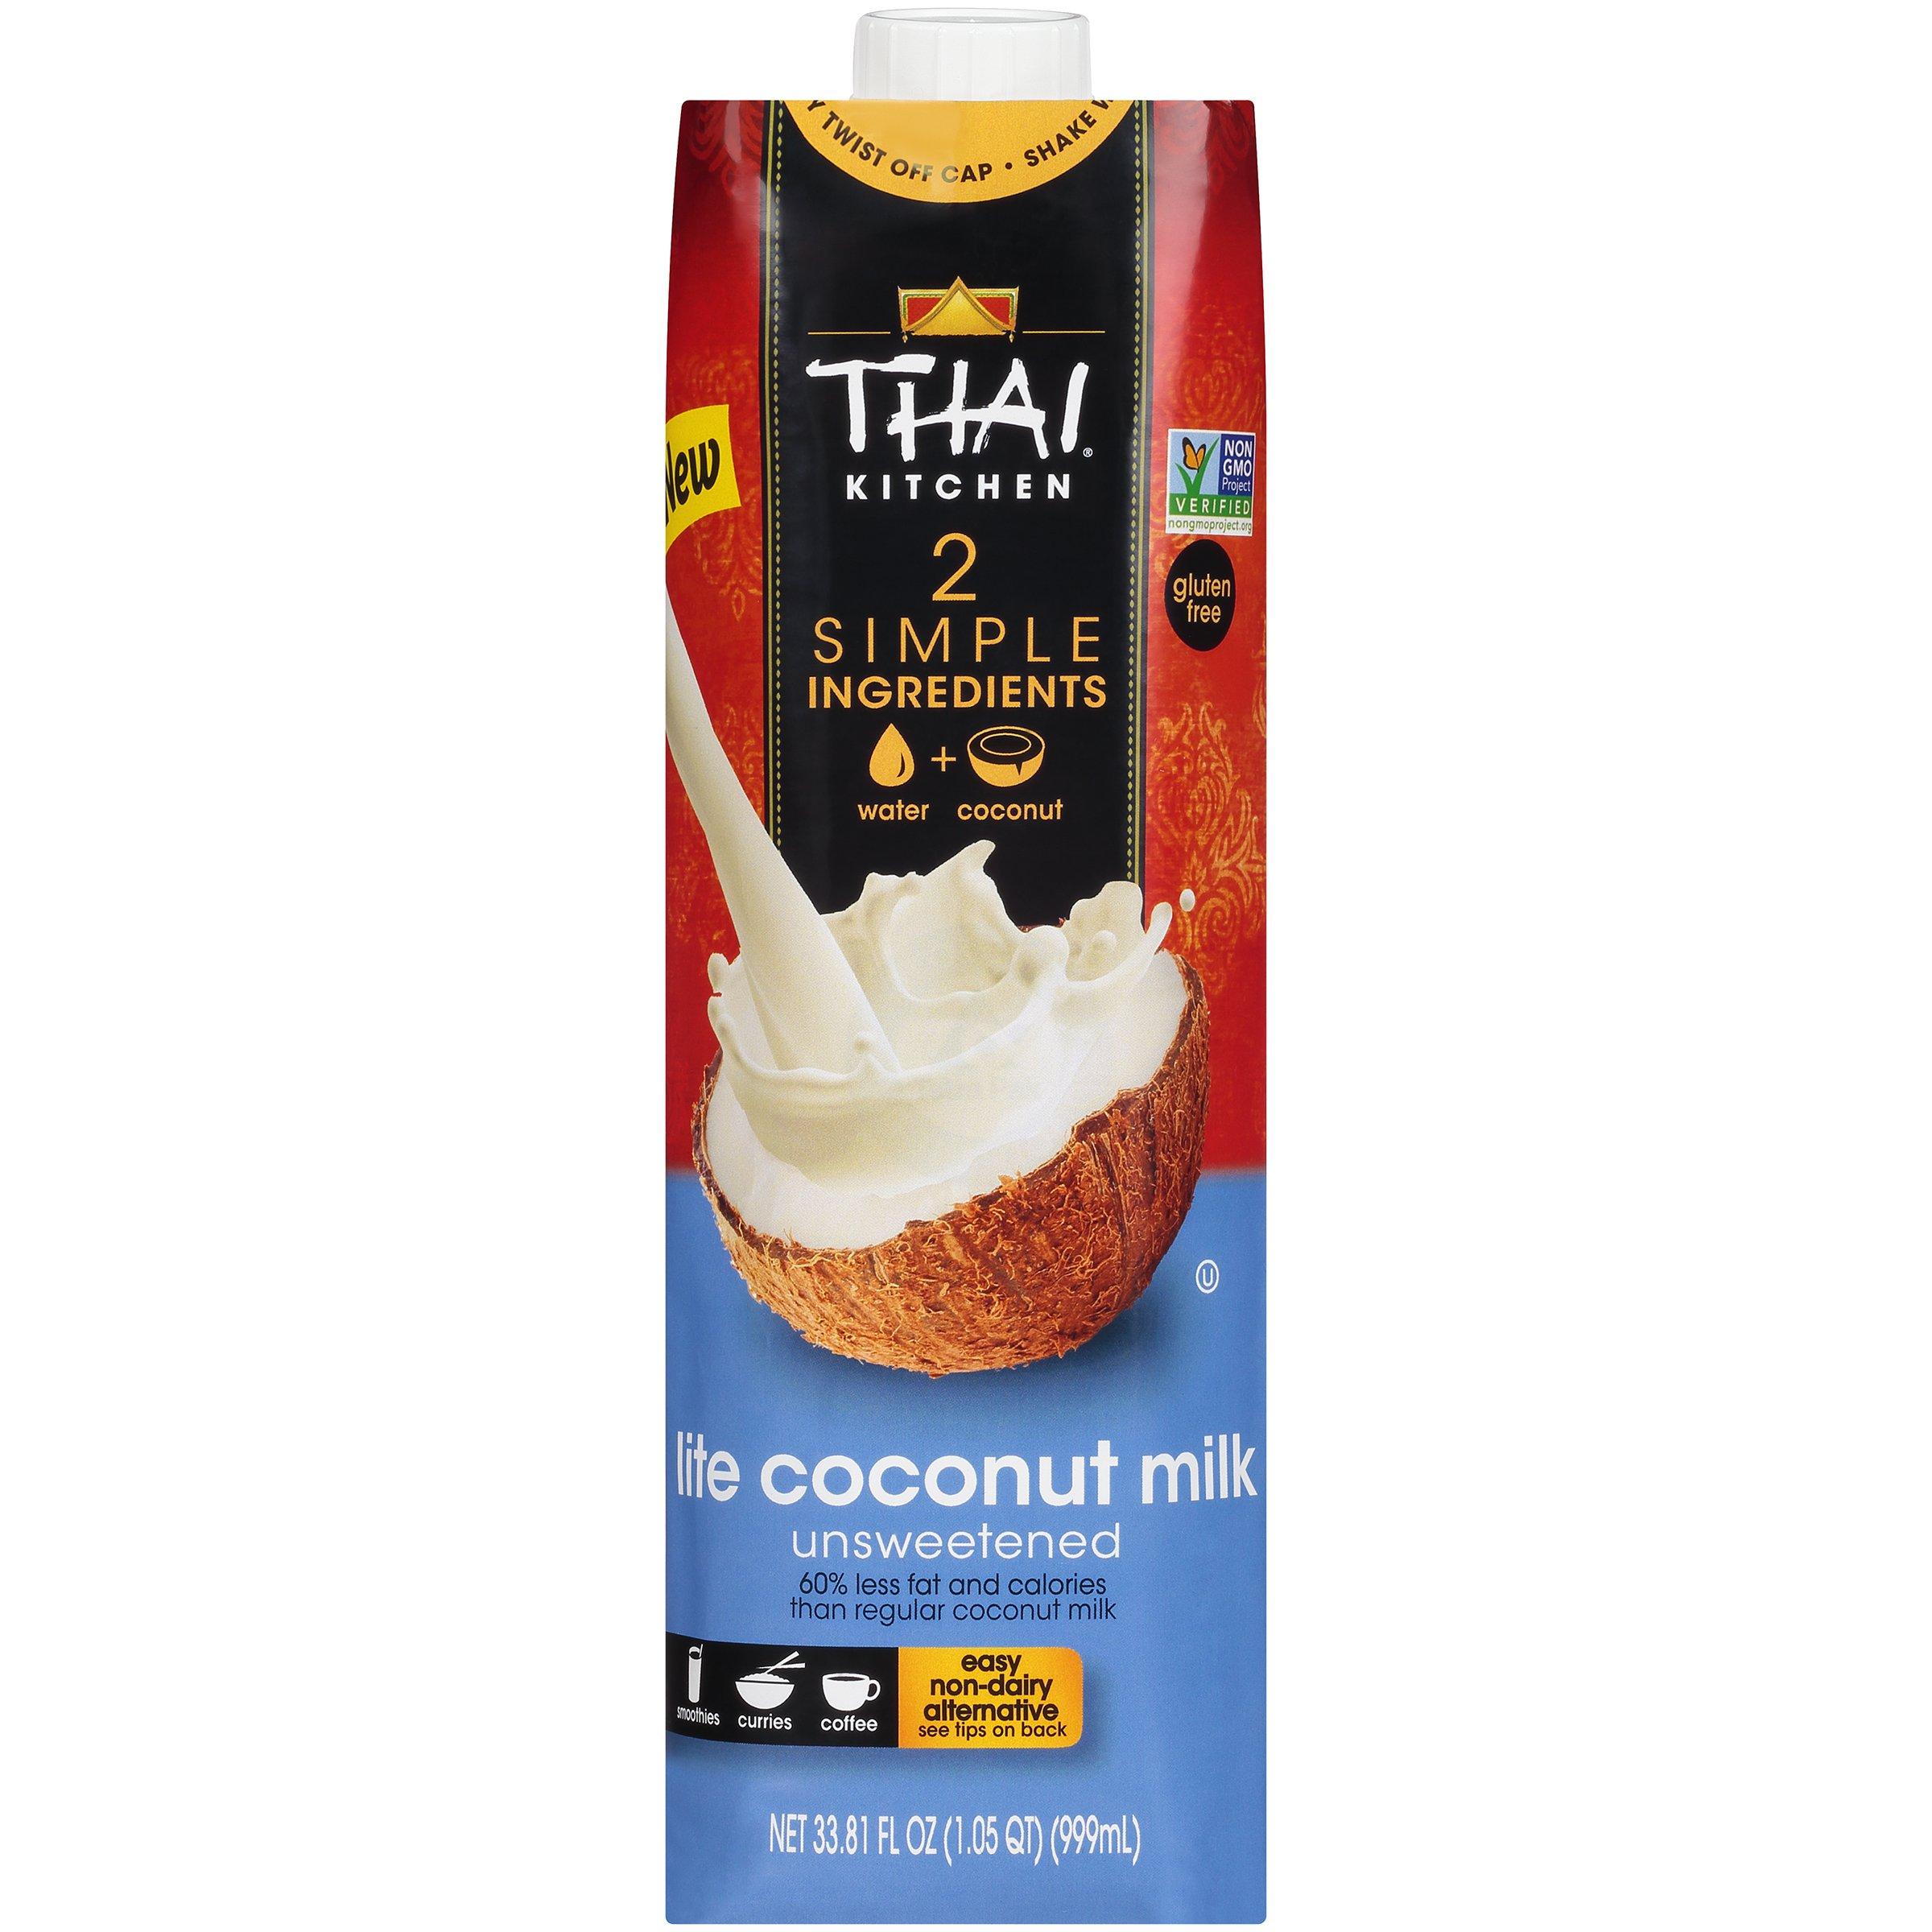 Thai Kitchen Coconut Milk Lite, 33.81 fl oz